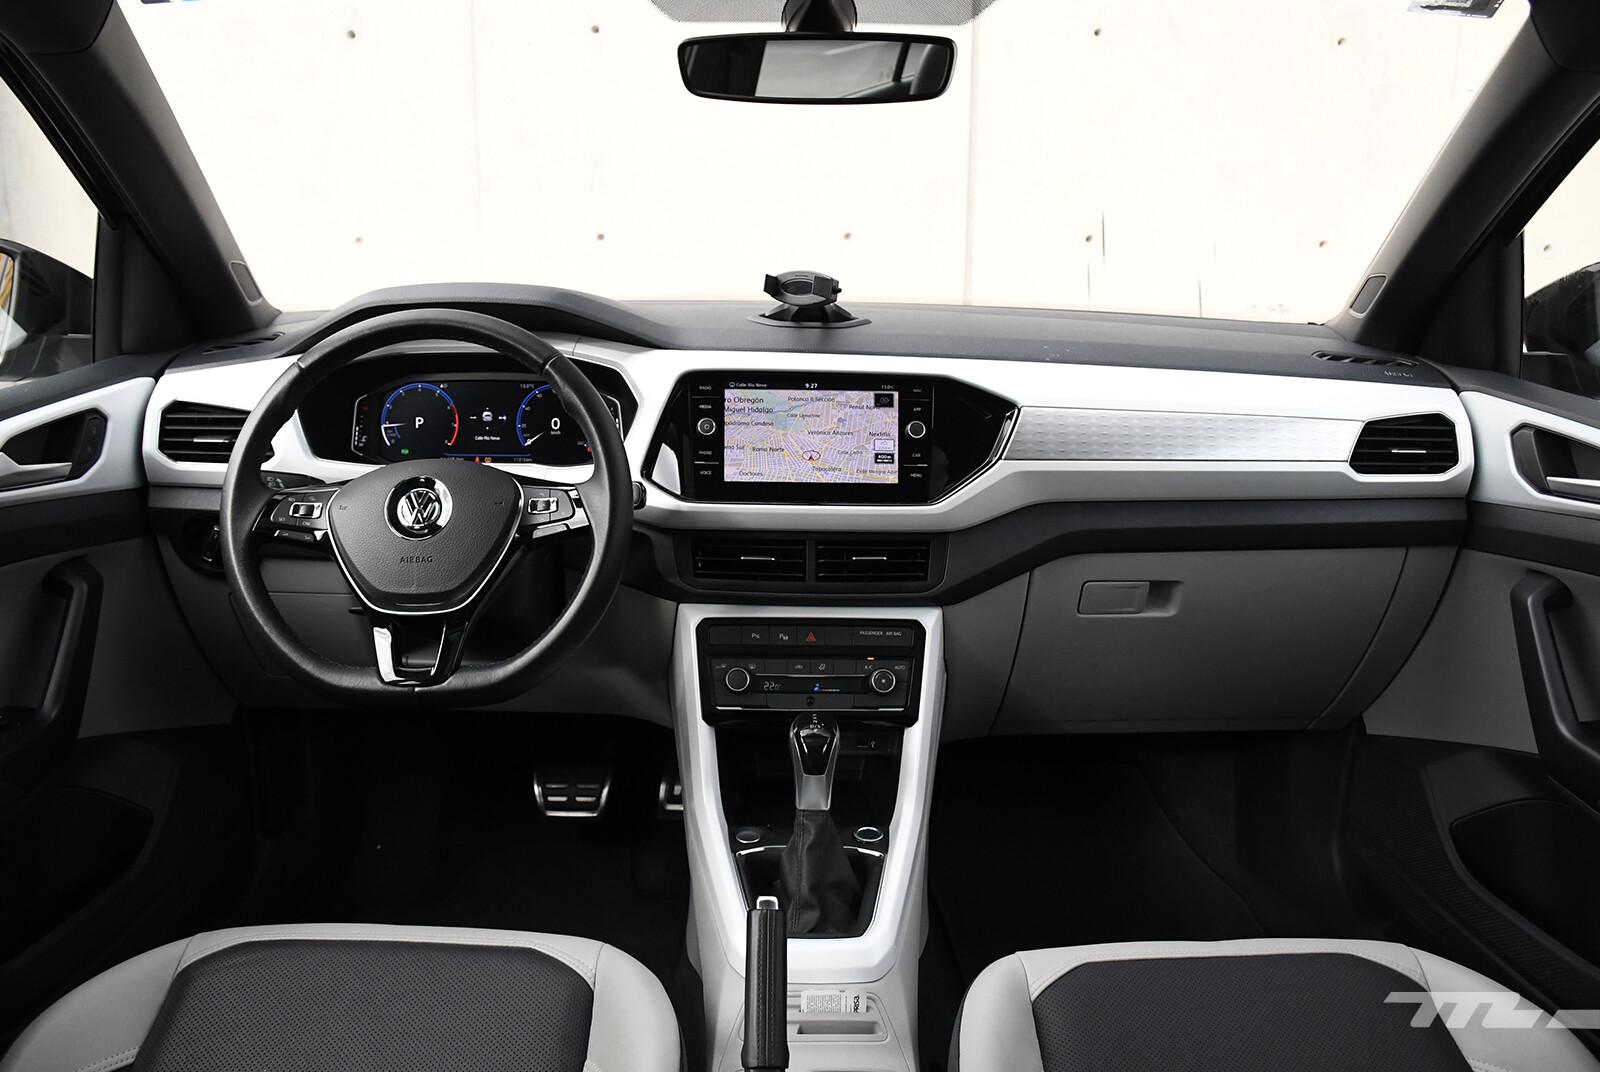 Foto de Chevrolet Tracker vs. Volkswagen T-Cross (comparativa) (23/29)